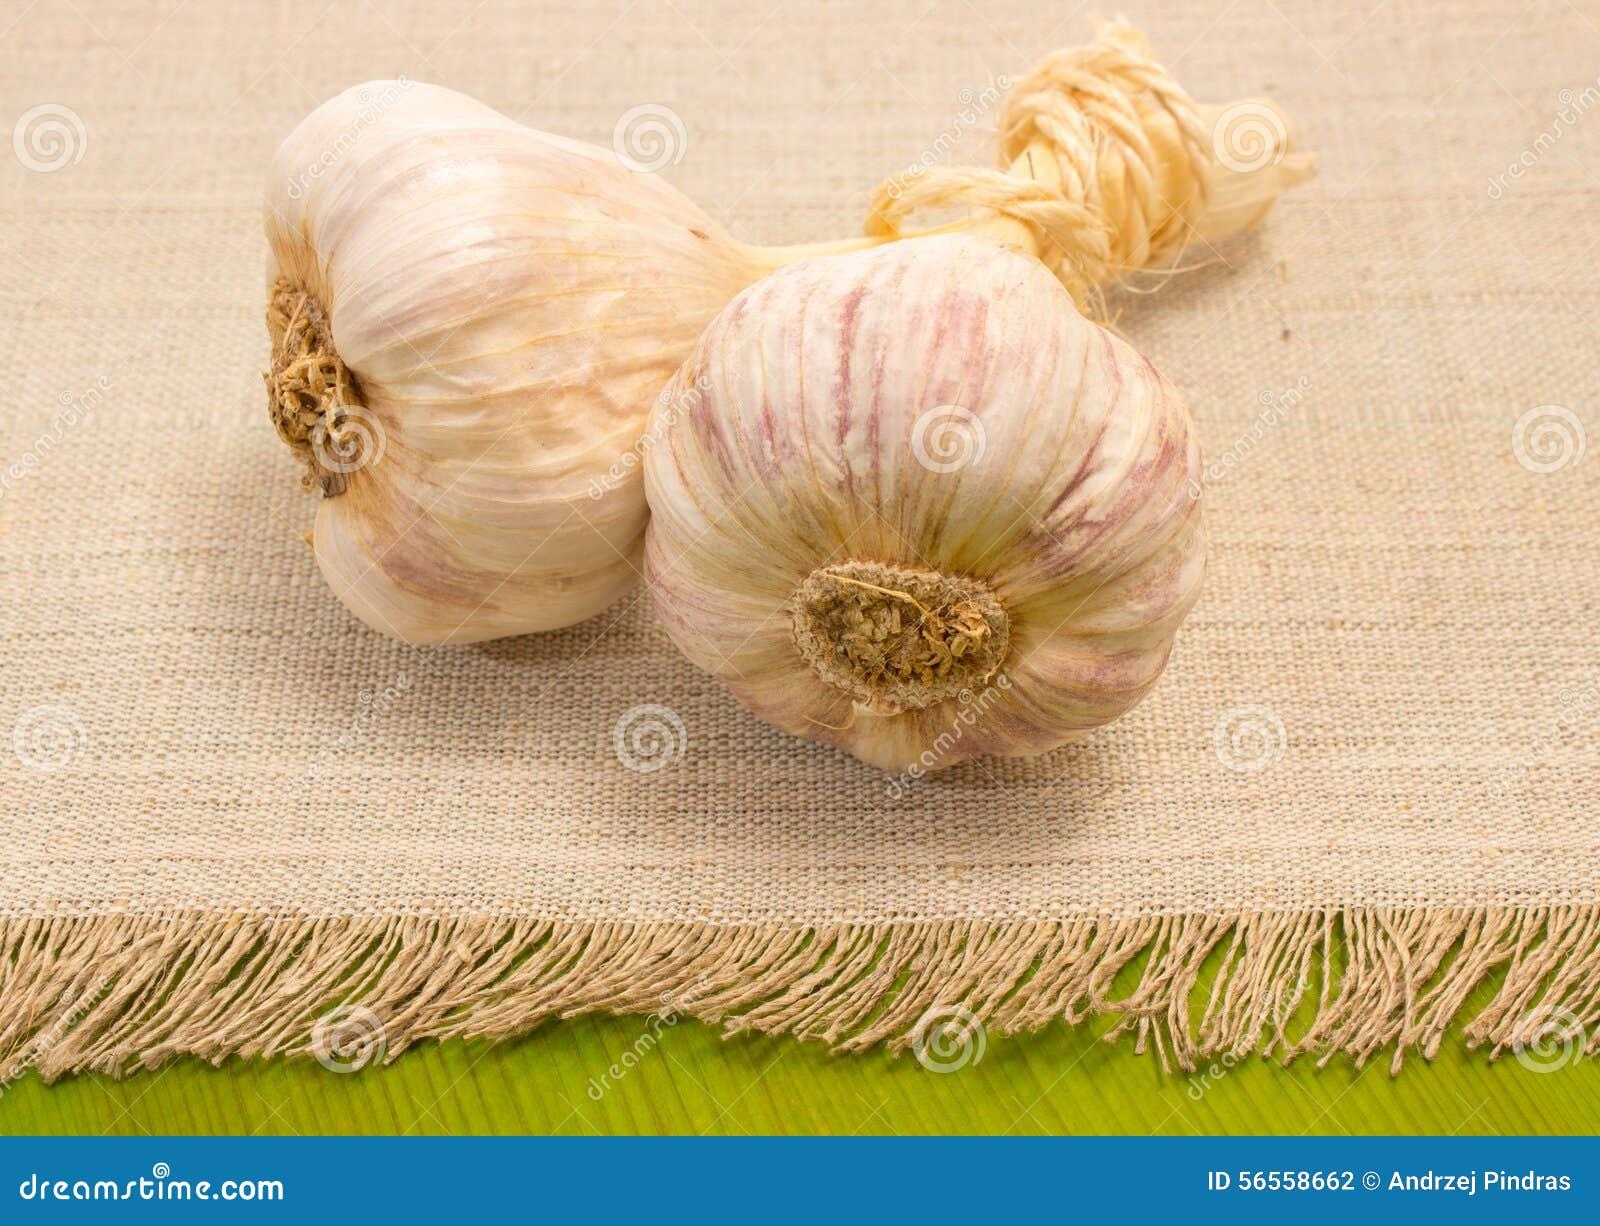 Download Φρέσκο σκόρδο πράσινο στενό σε επάνω πινάκων Στοκ Εικόνες - εικόνα από vegan, συμπληρώματα: 56558662